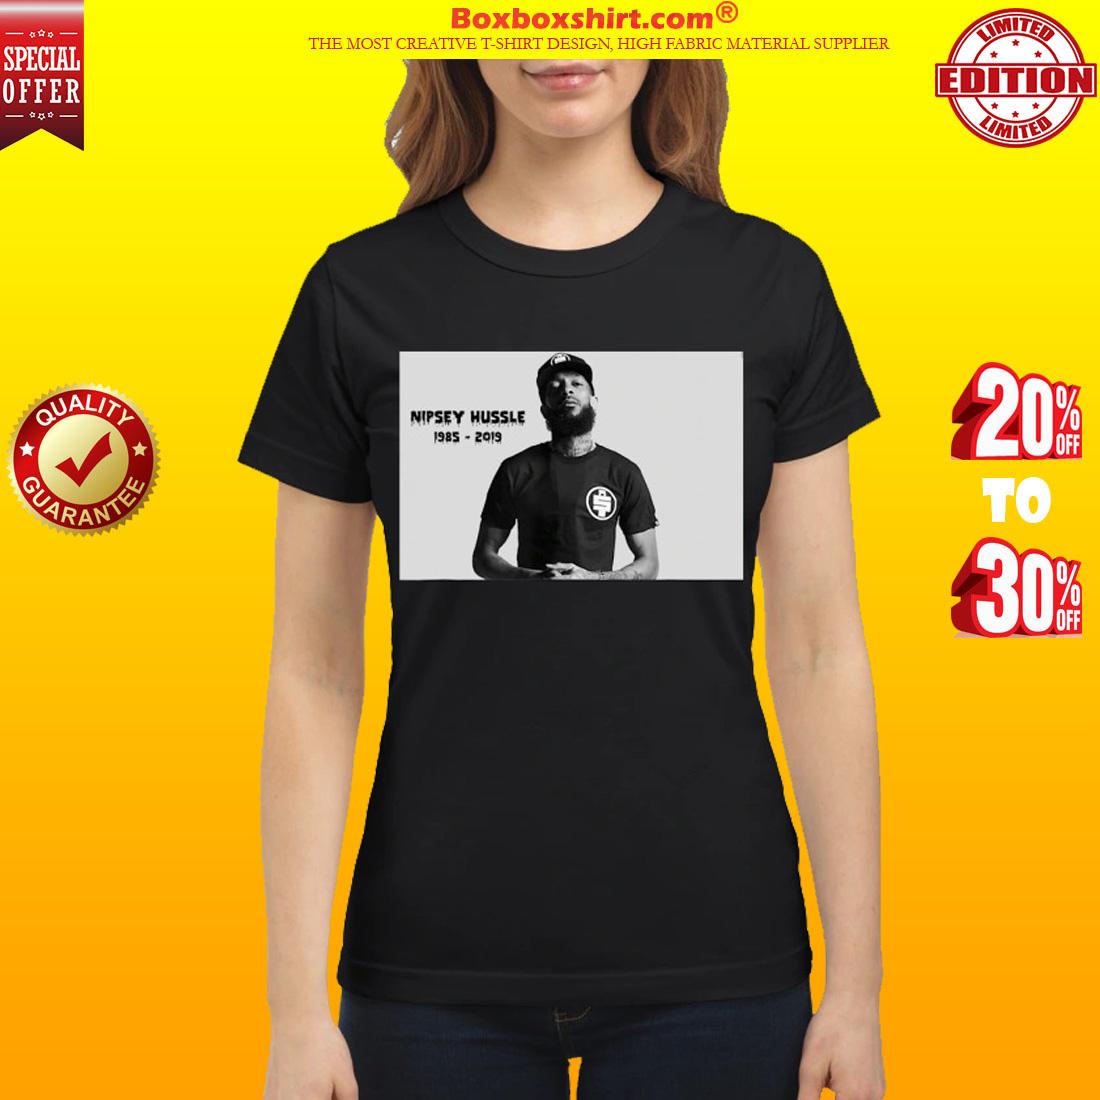 RIP Nipsey Hussle 1985 2019 classic shirt